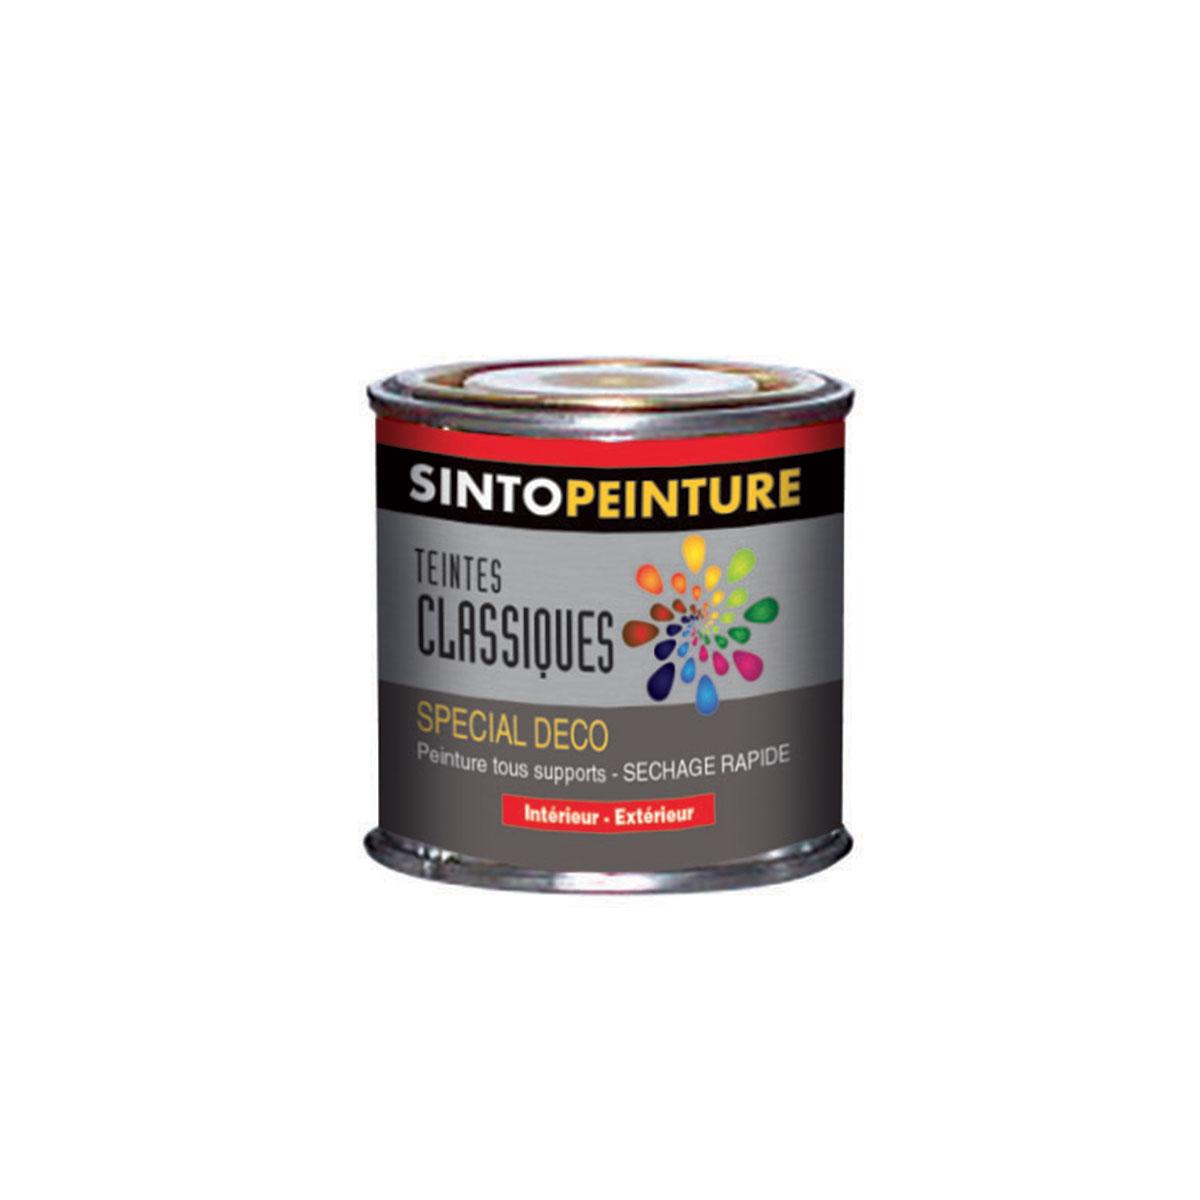 Sintopeinture Peinture Tableau Noir En Bombe Sinto